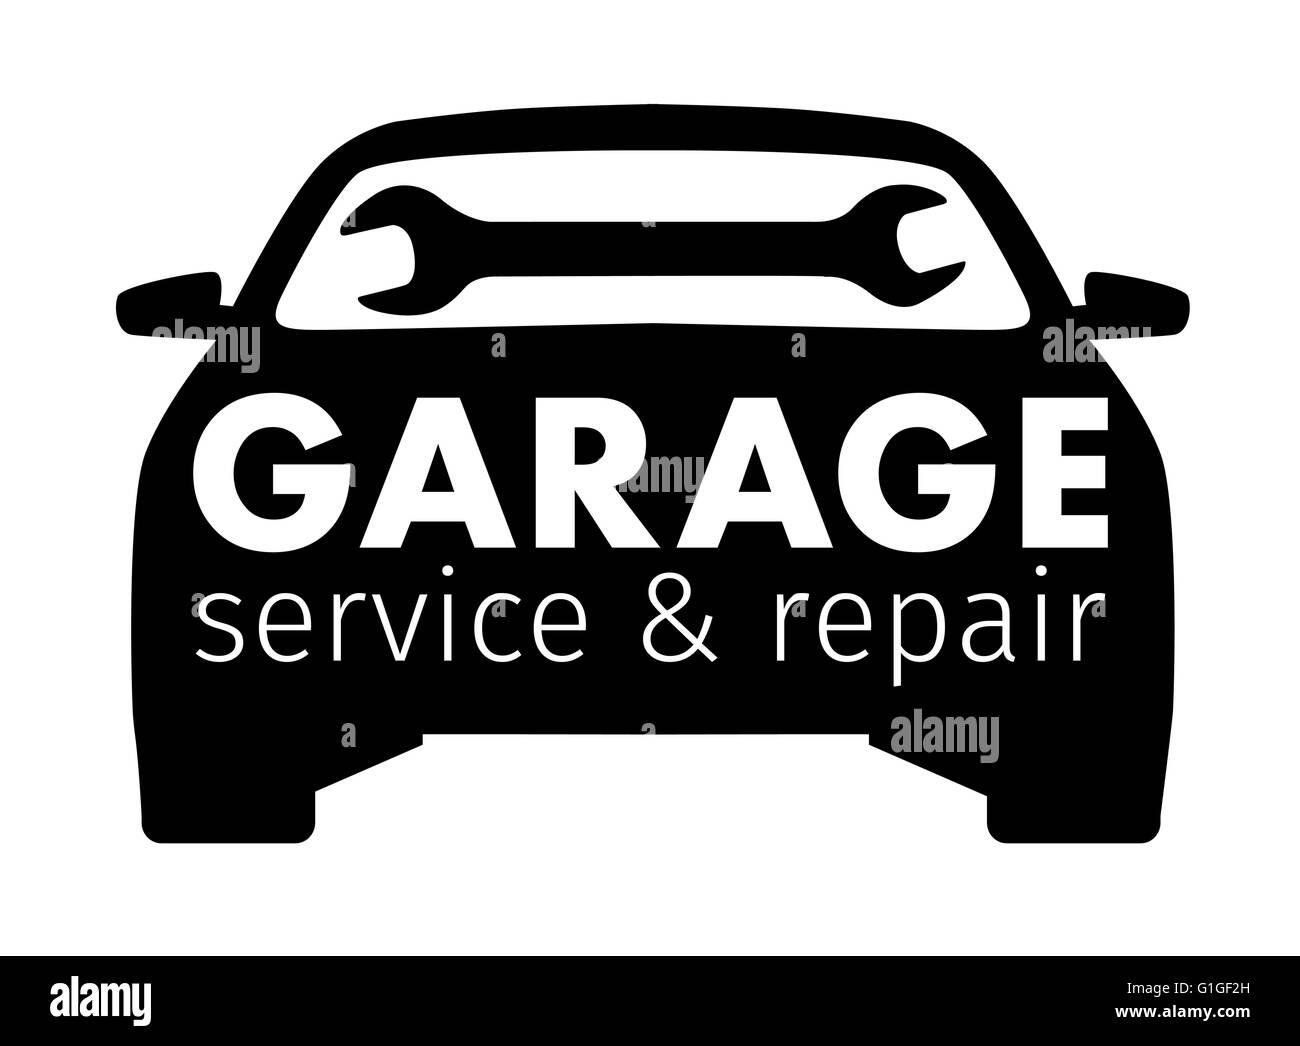 auto center garage service and repair logo vector template stock